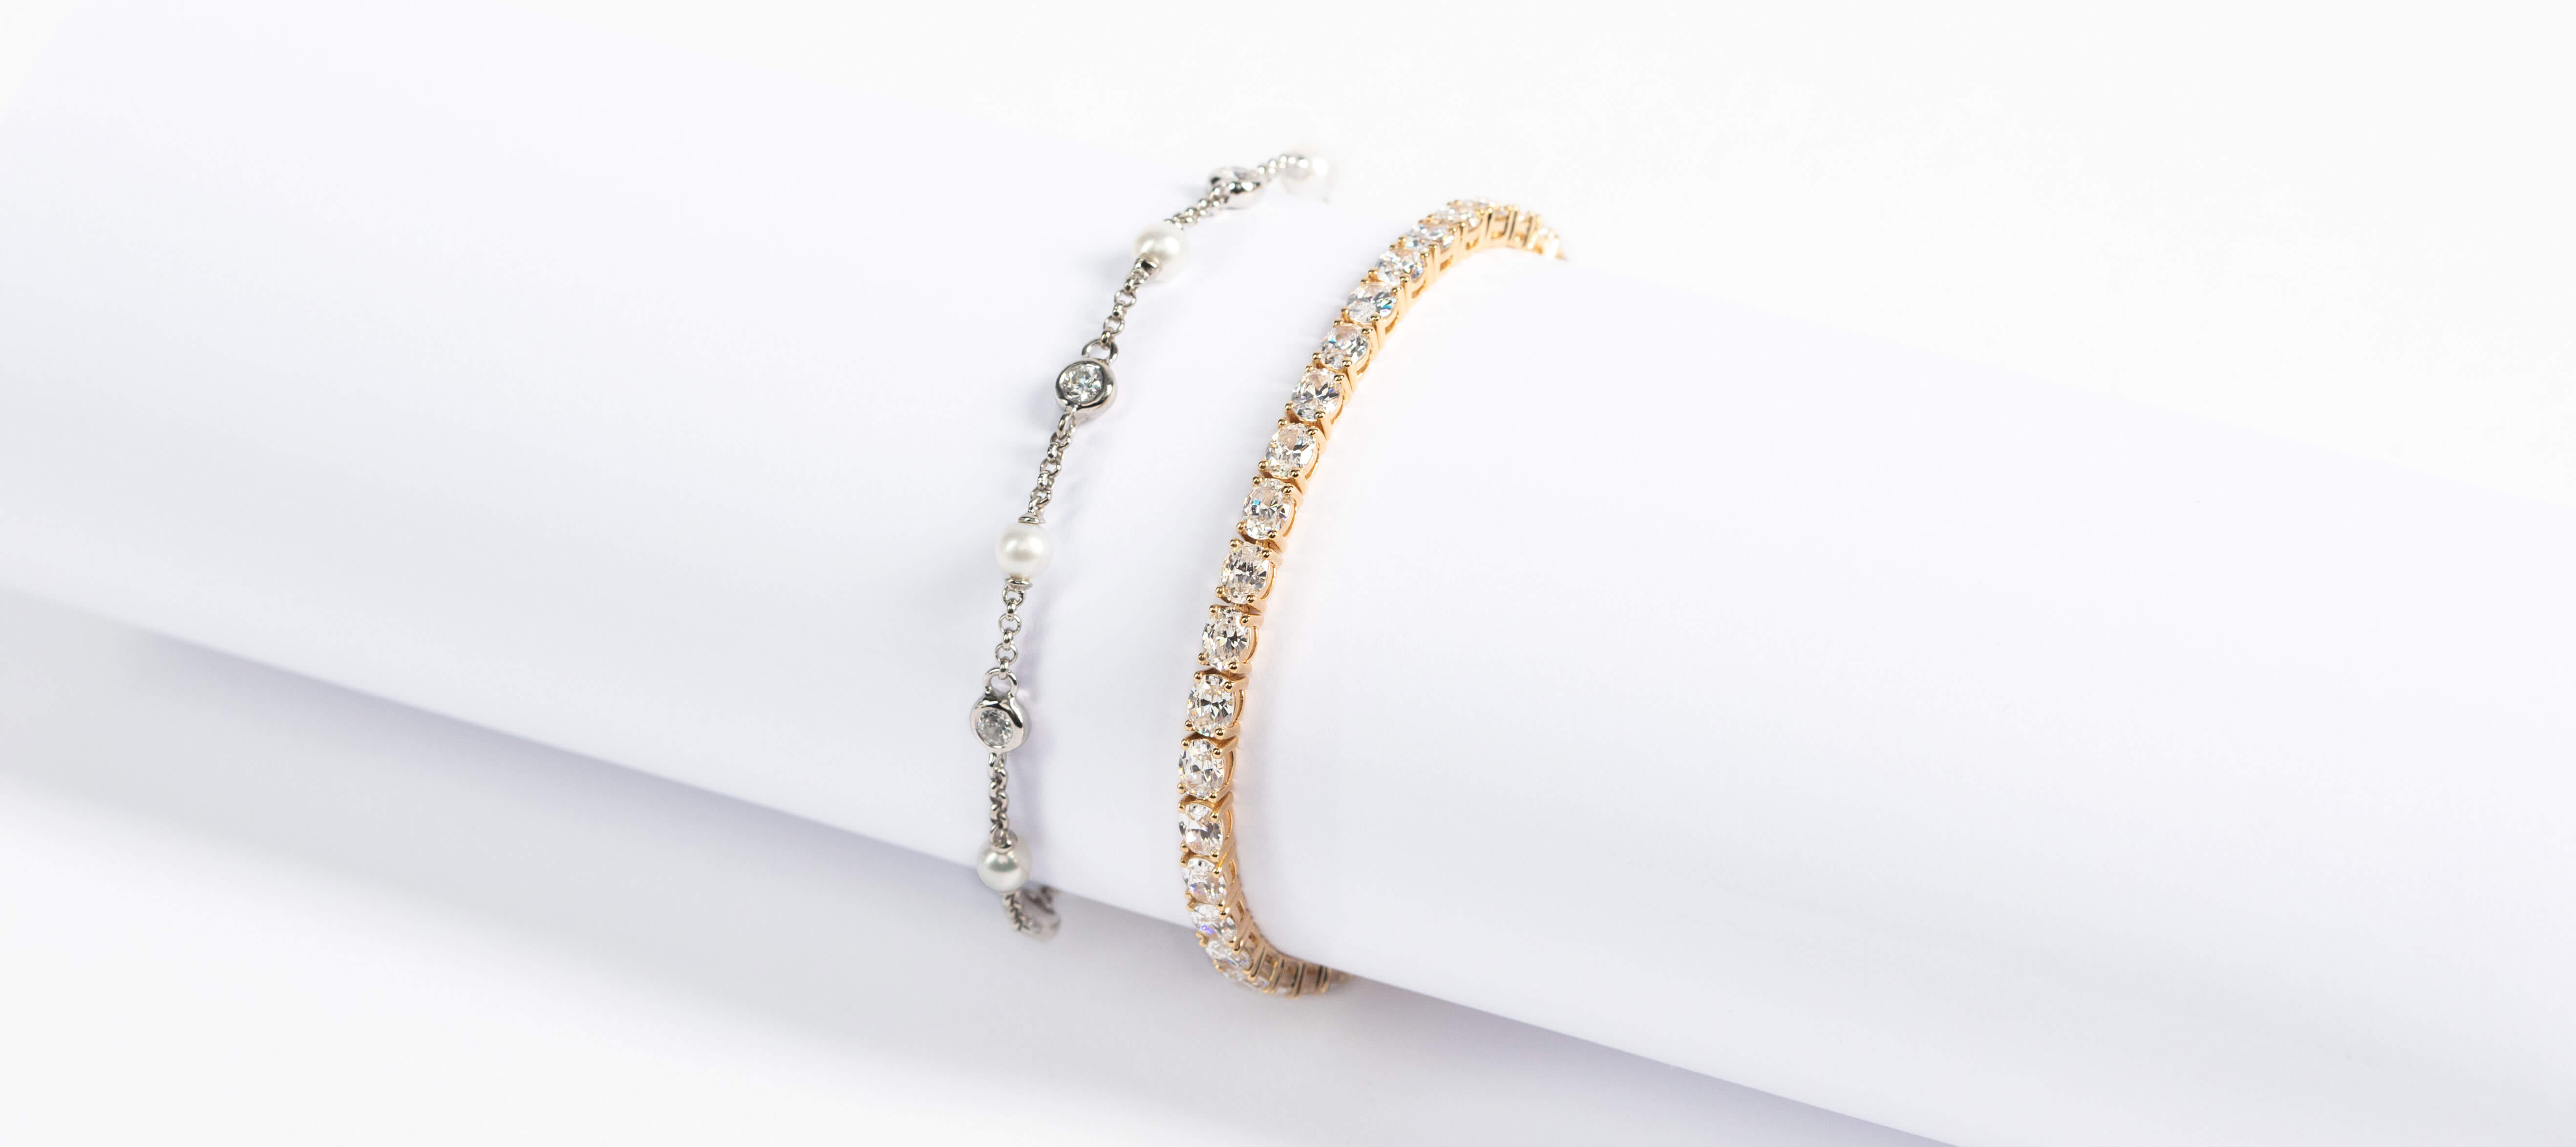 A yellow and white gold bracelet featuring Nexus Diamond alternatives.